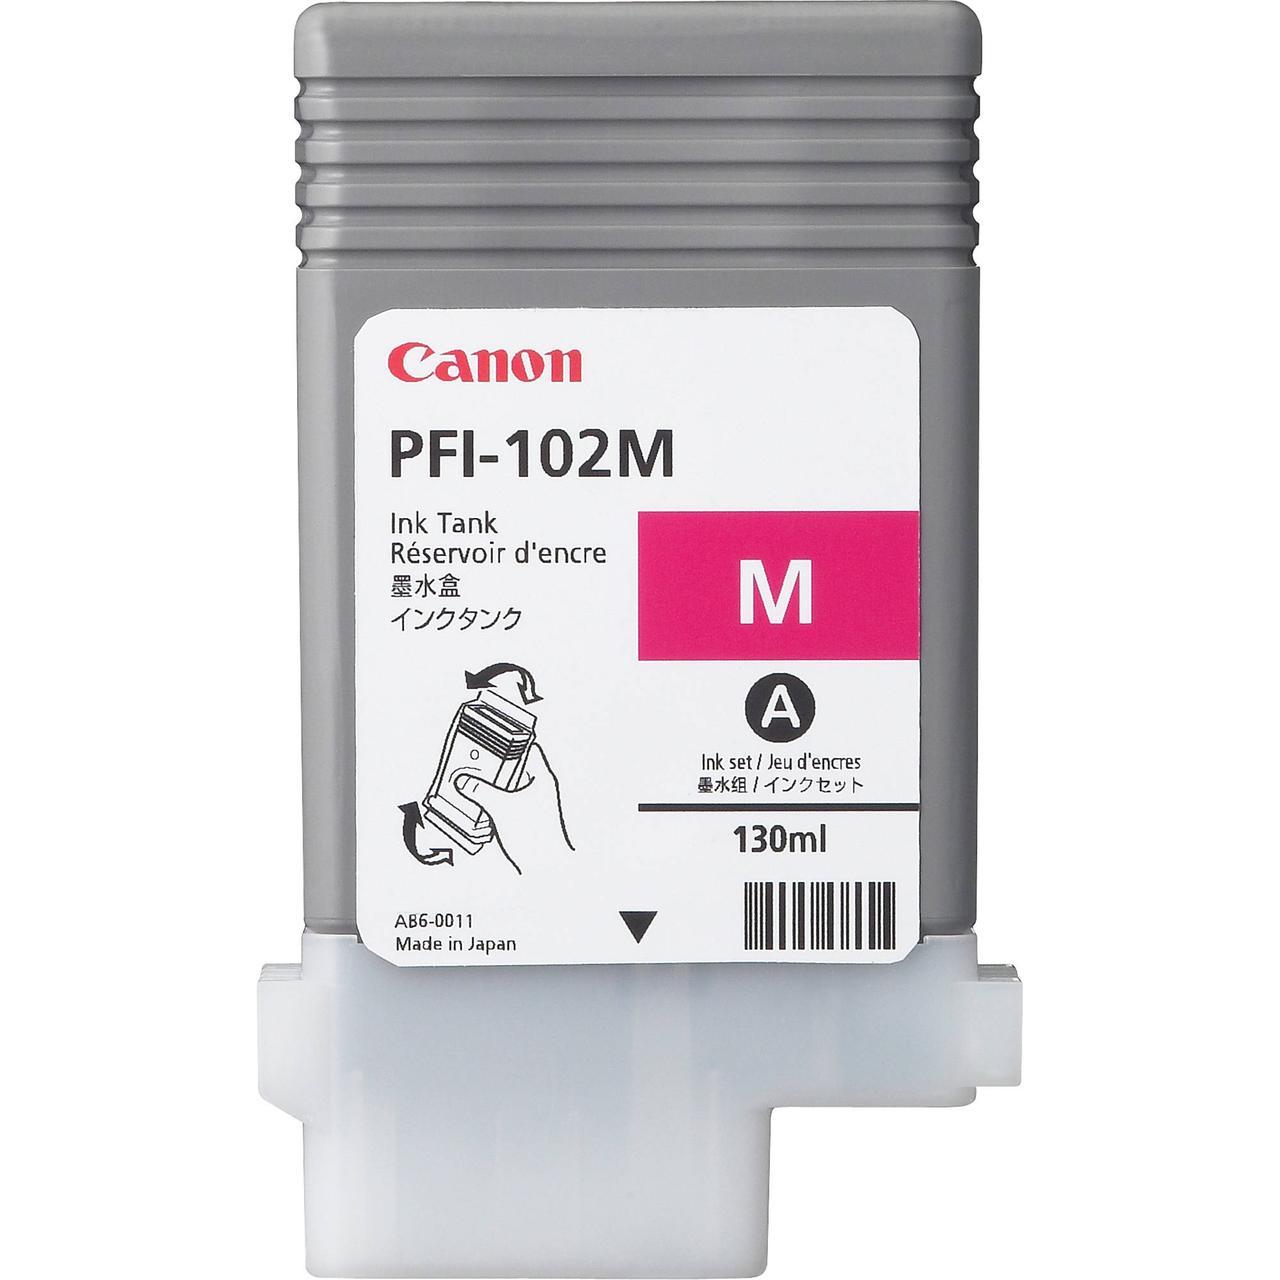 Картридж Canon PFI-102M для iPF600/700, Magenta, 130 мл